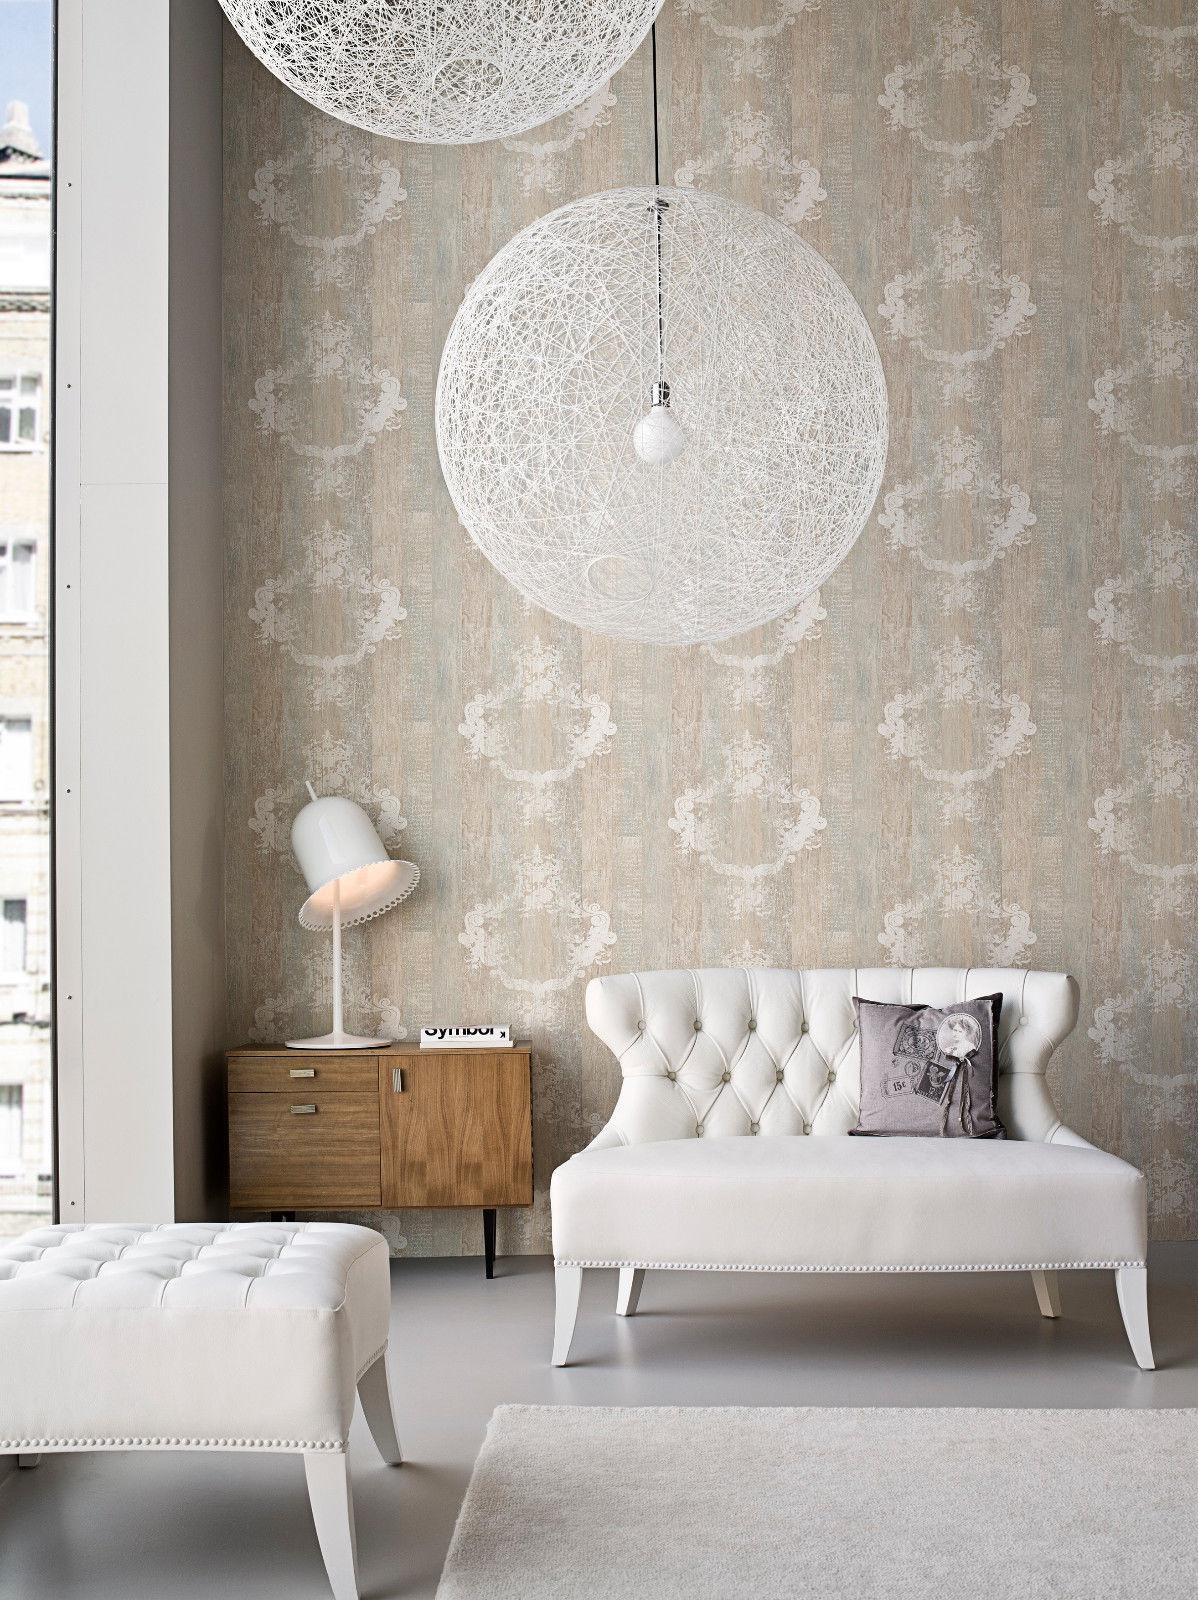 vlies tapete antik holz muster ornament barock braun grau beige elements kaufen bei joratrend e k. Black Bedroom Furniture Sets. Home Design Ideas